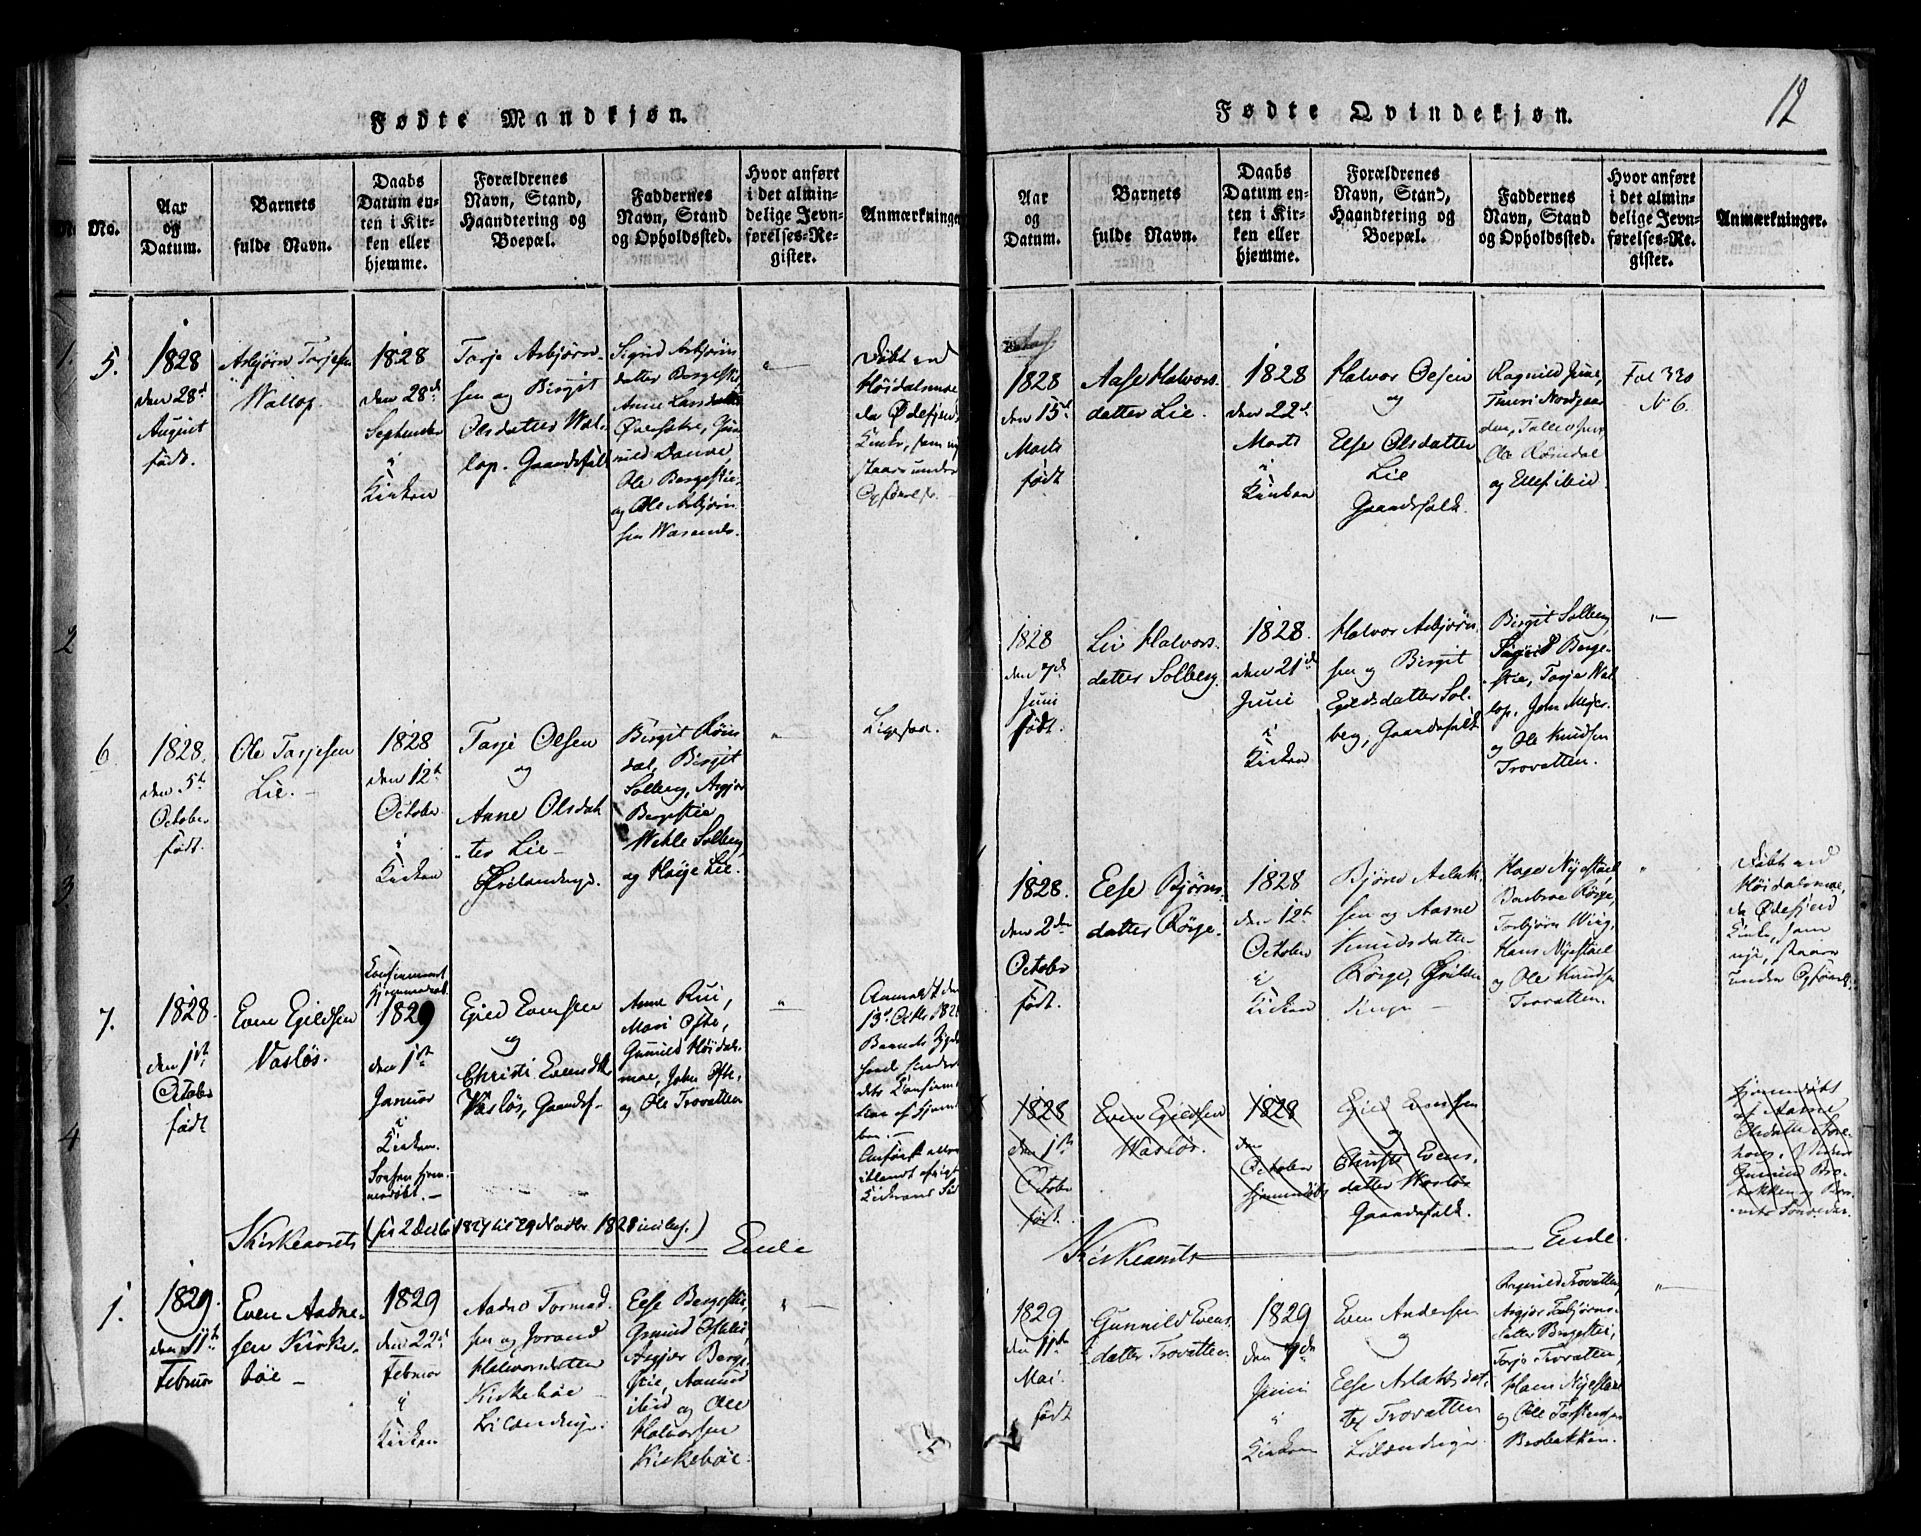 SAKO, Rauland kirkebøker, F/Fa/L0002: Ministerialbok nr. 2, 1815-1860, s. 12